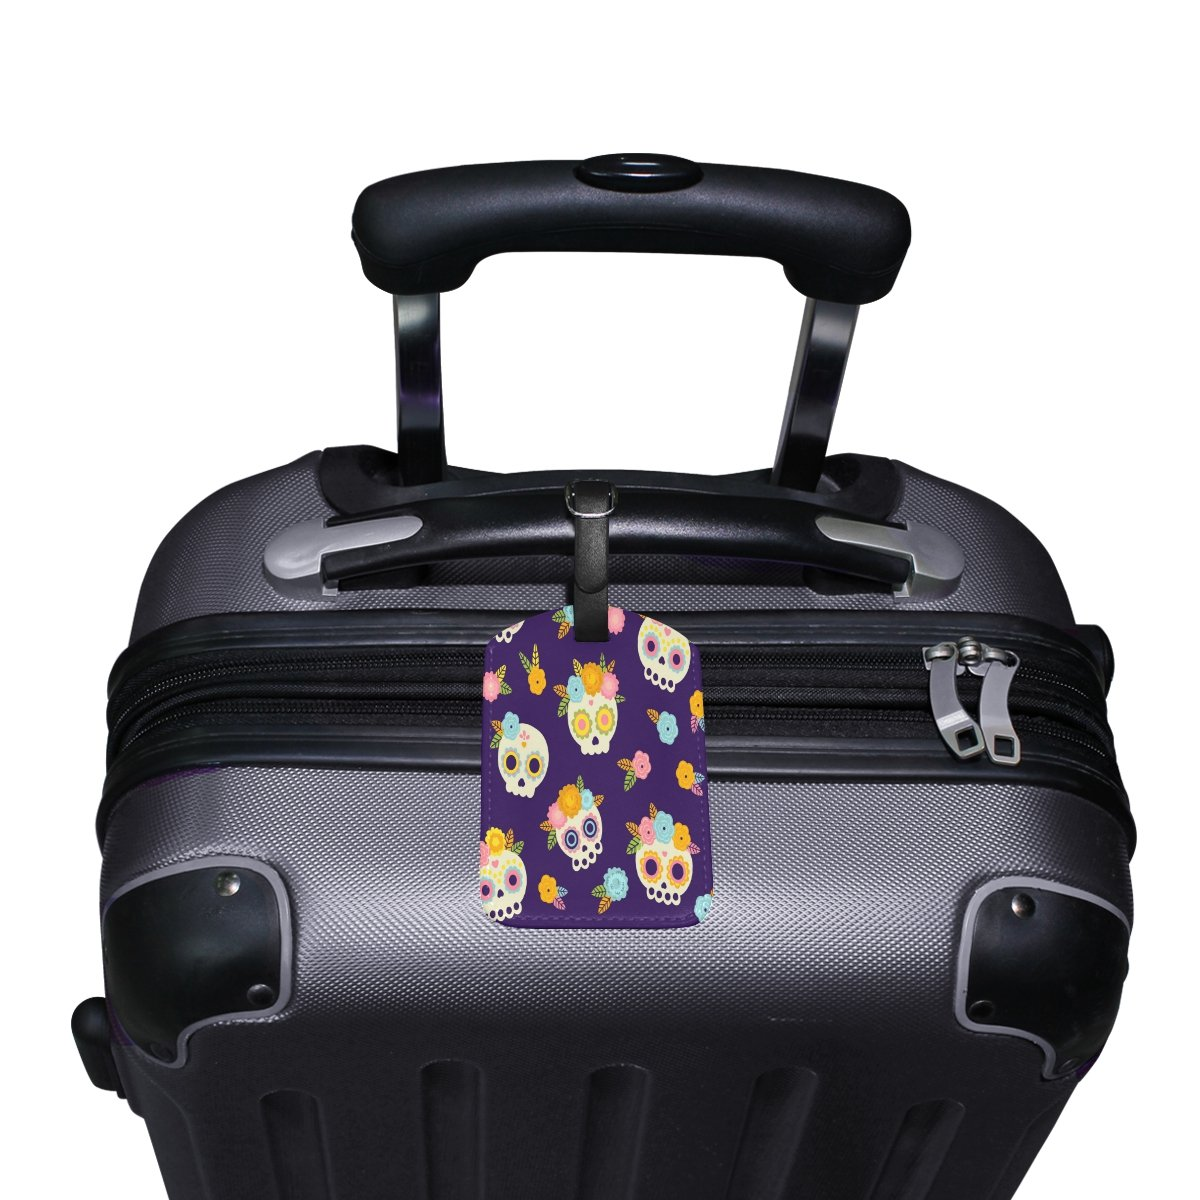 Saobao Travel Luggage Tag Skulls With Flowers PU Leather Baggage Travel ID